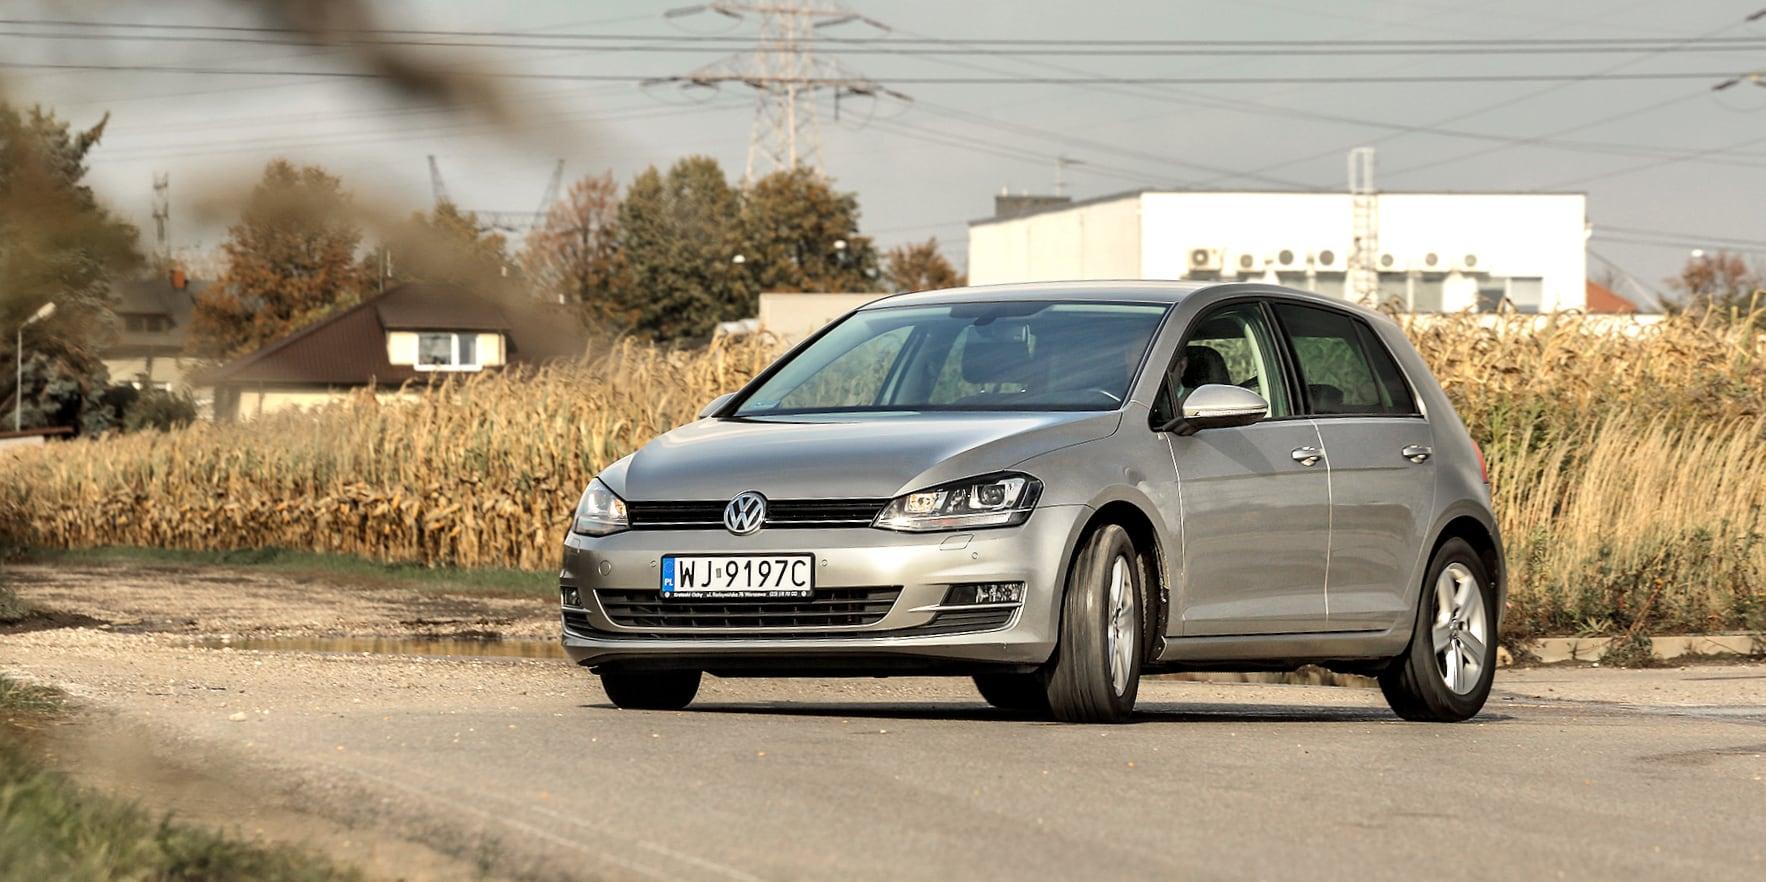 Volkswagen-Golf-VII-1.4-TSI-DSG_4